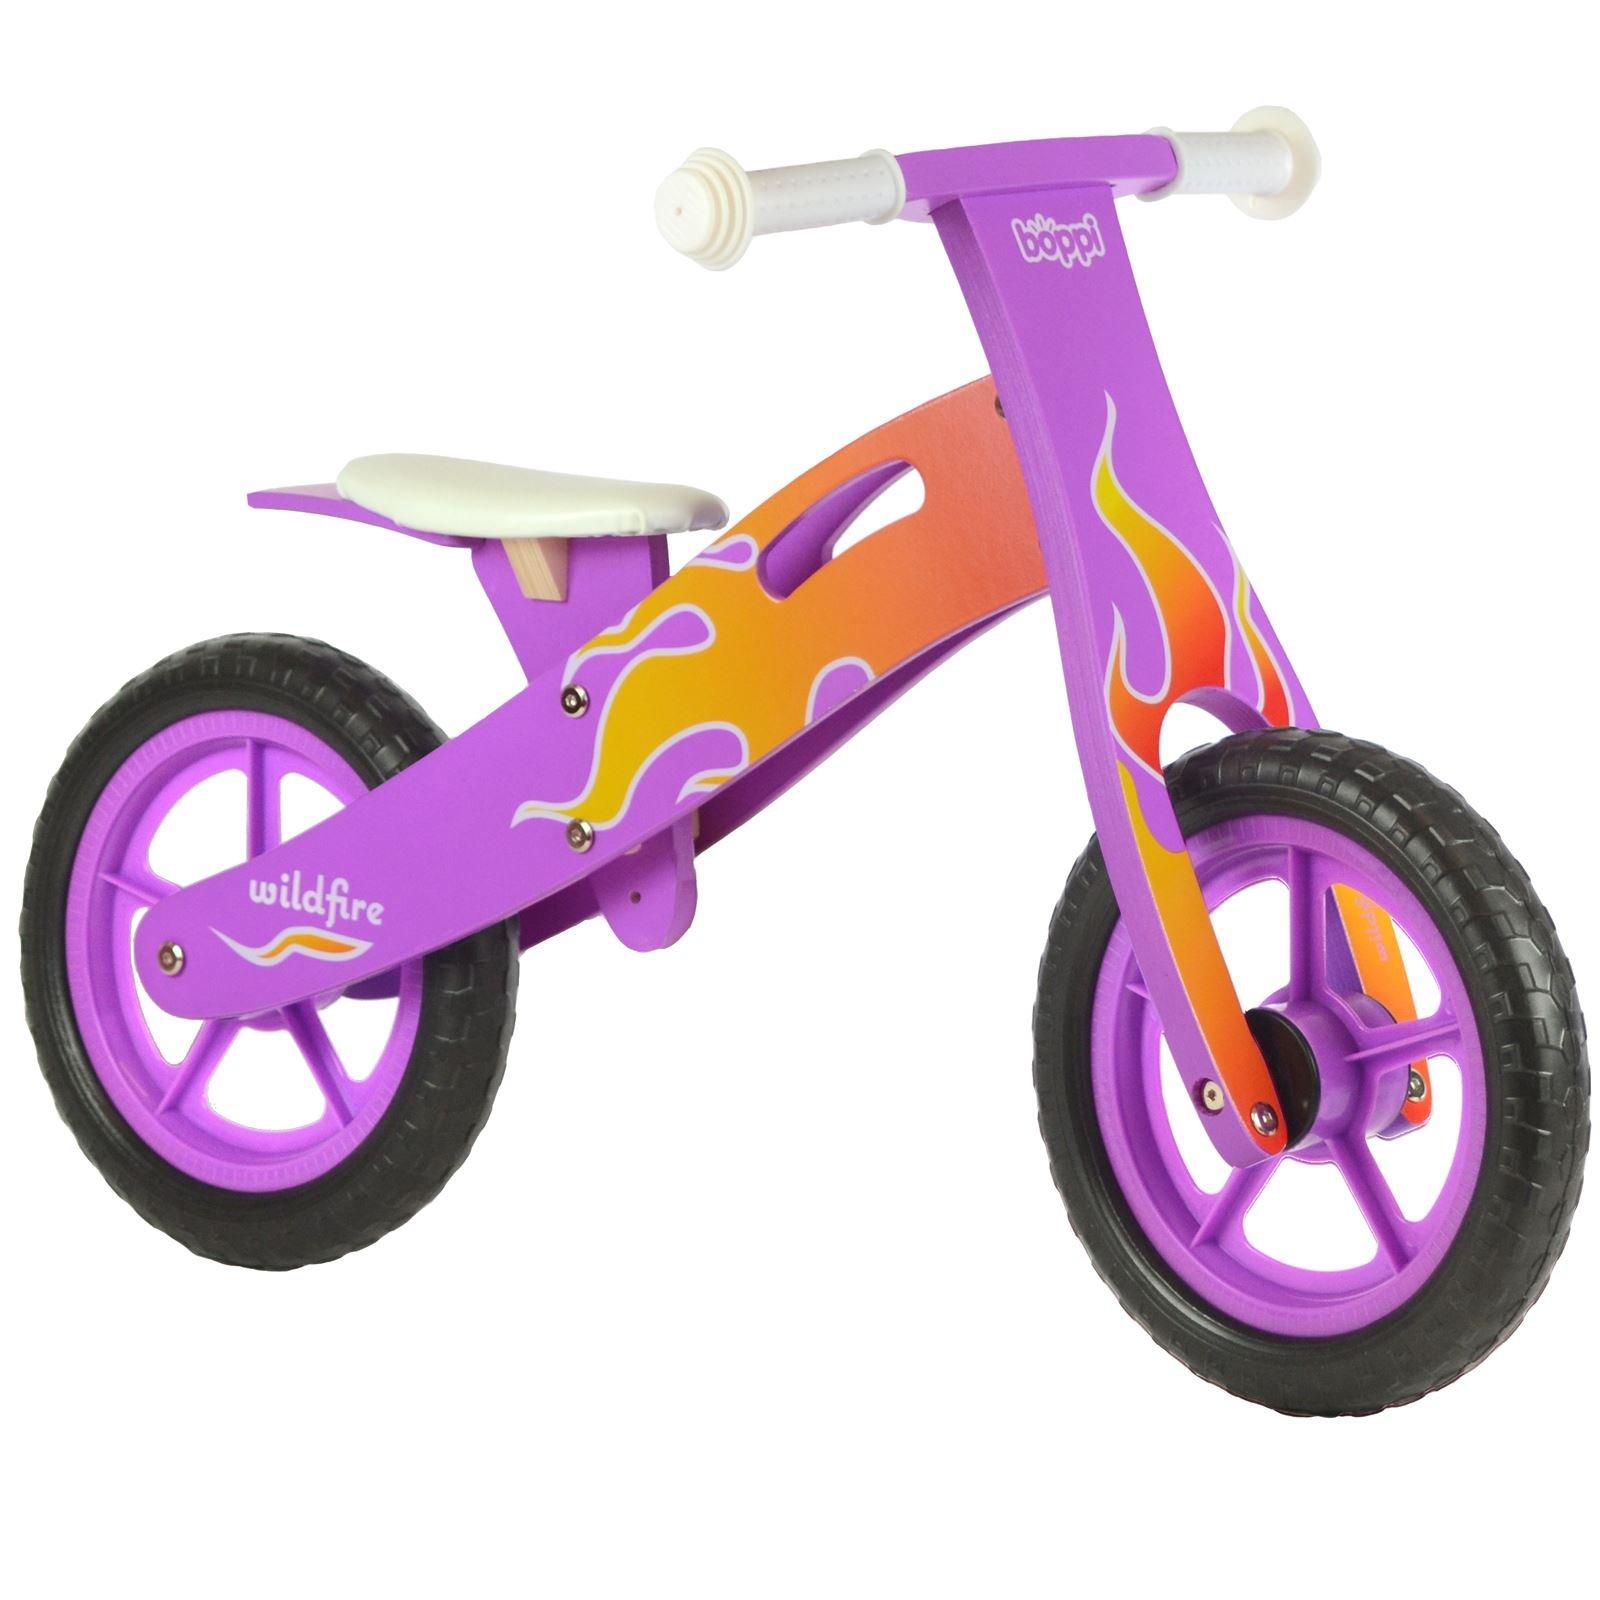 boppi Kids Wooden Balance Bike - 2, 3, 4 and 5 years - Purple Flame